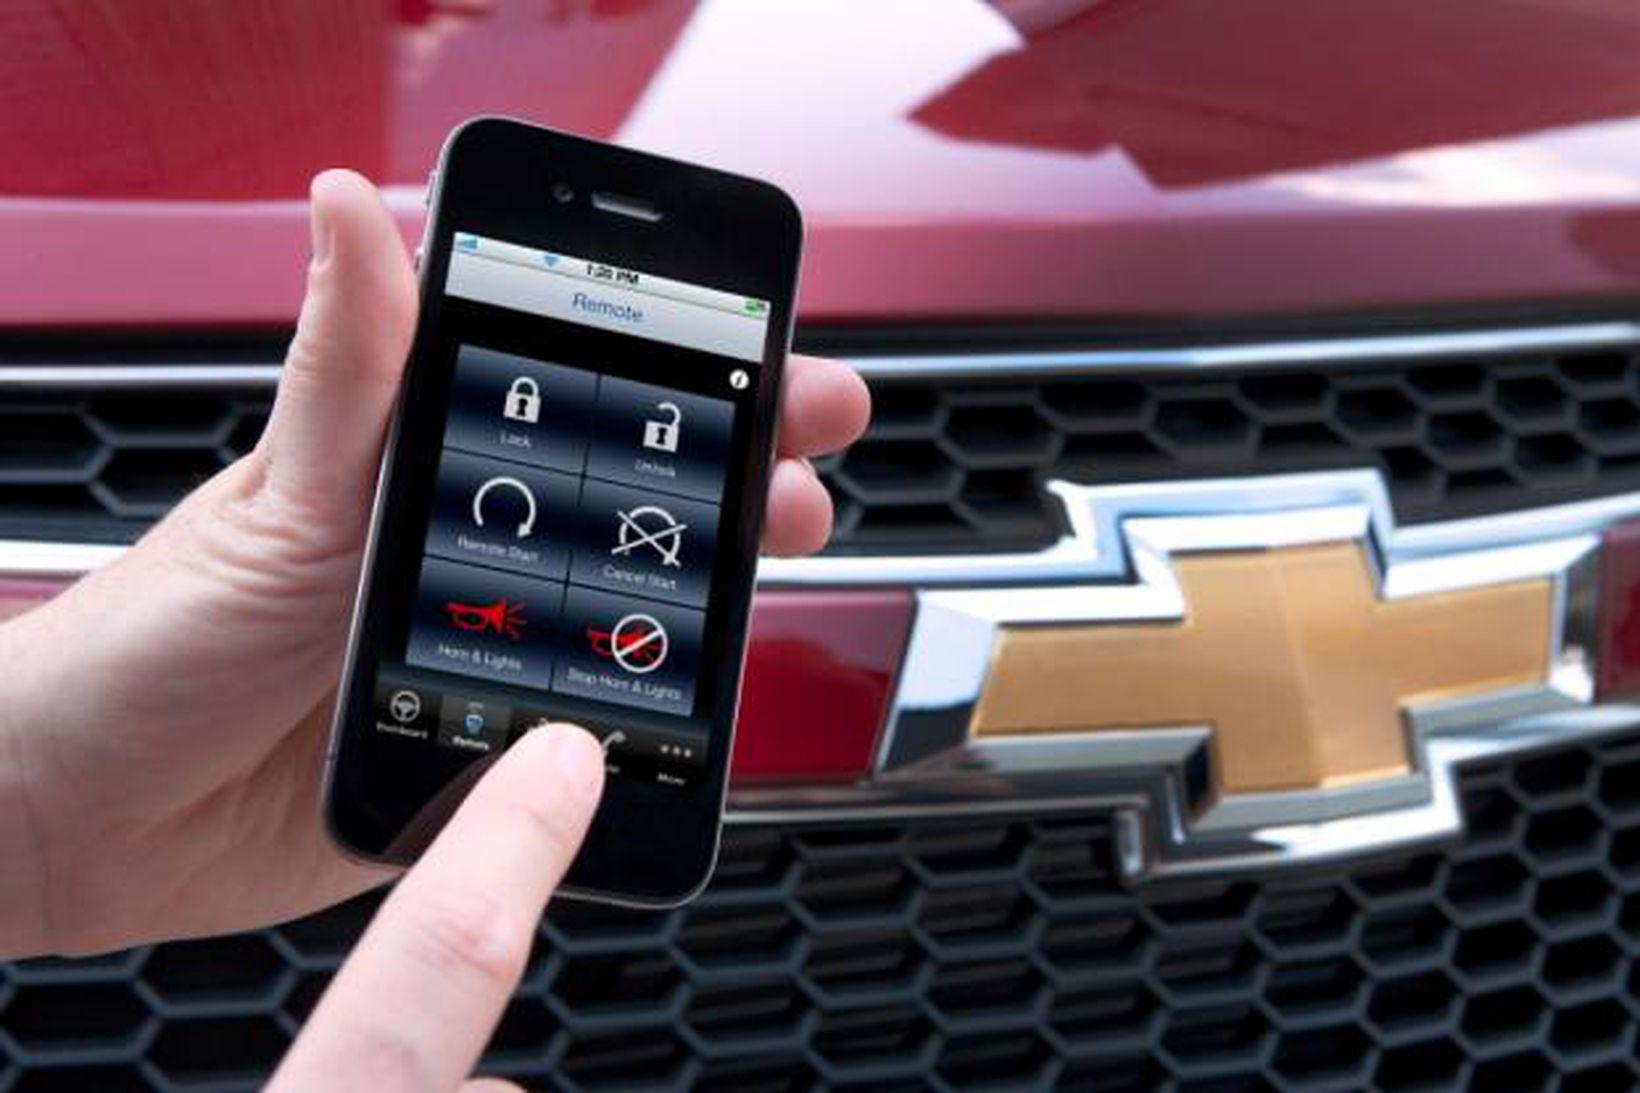 Nýtt app fyrir Chevrolet bíla virkar betur en fjarstýring